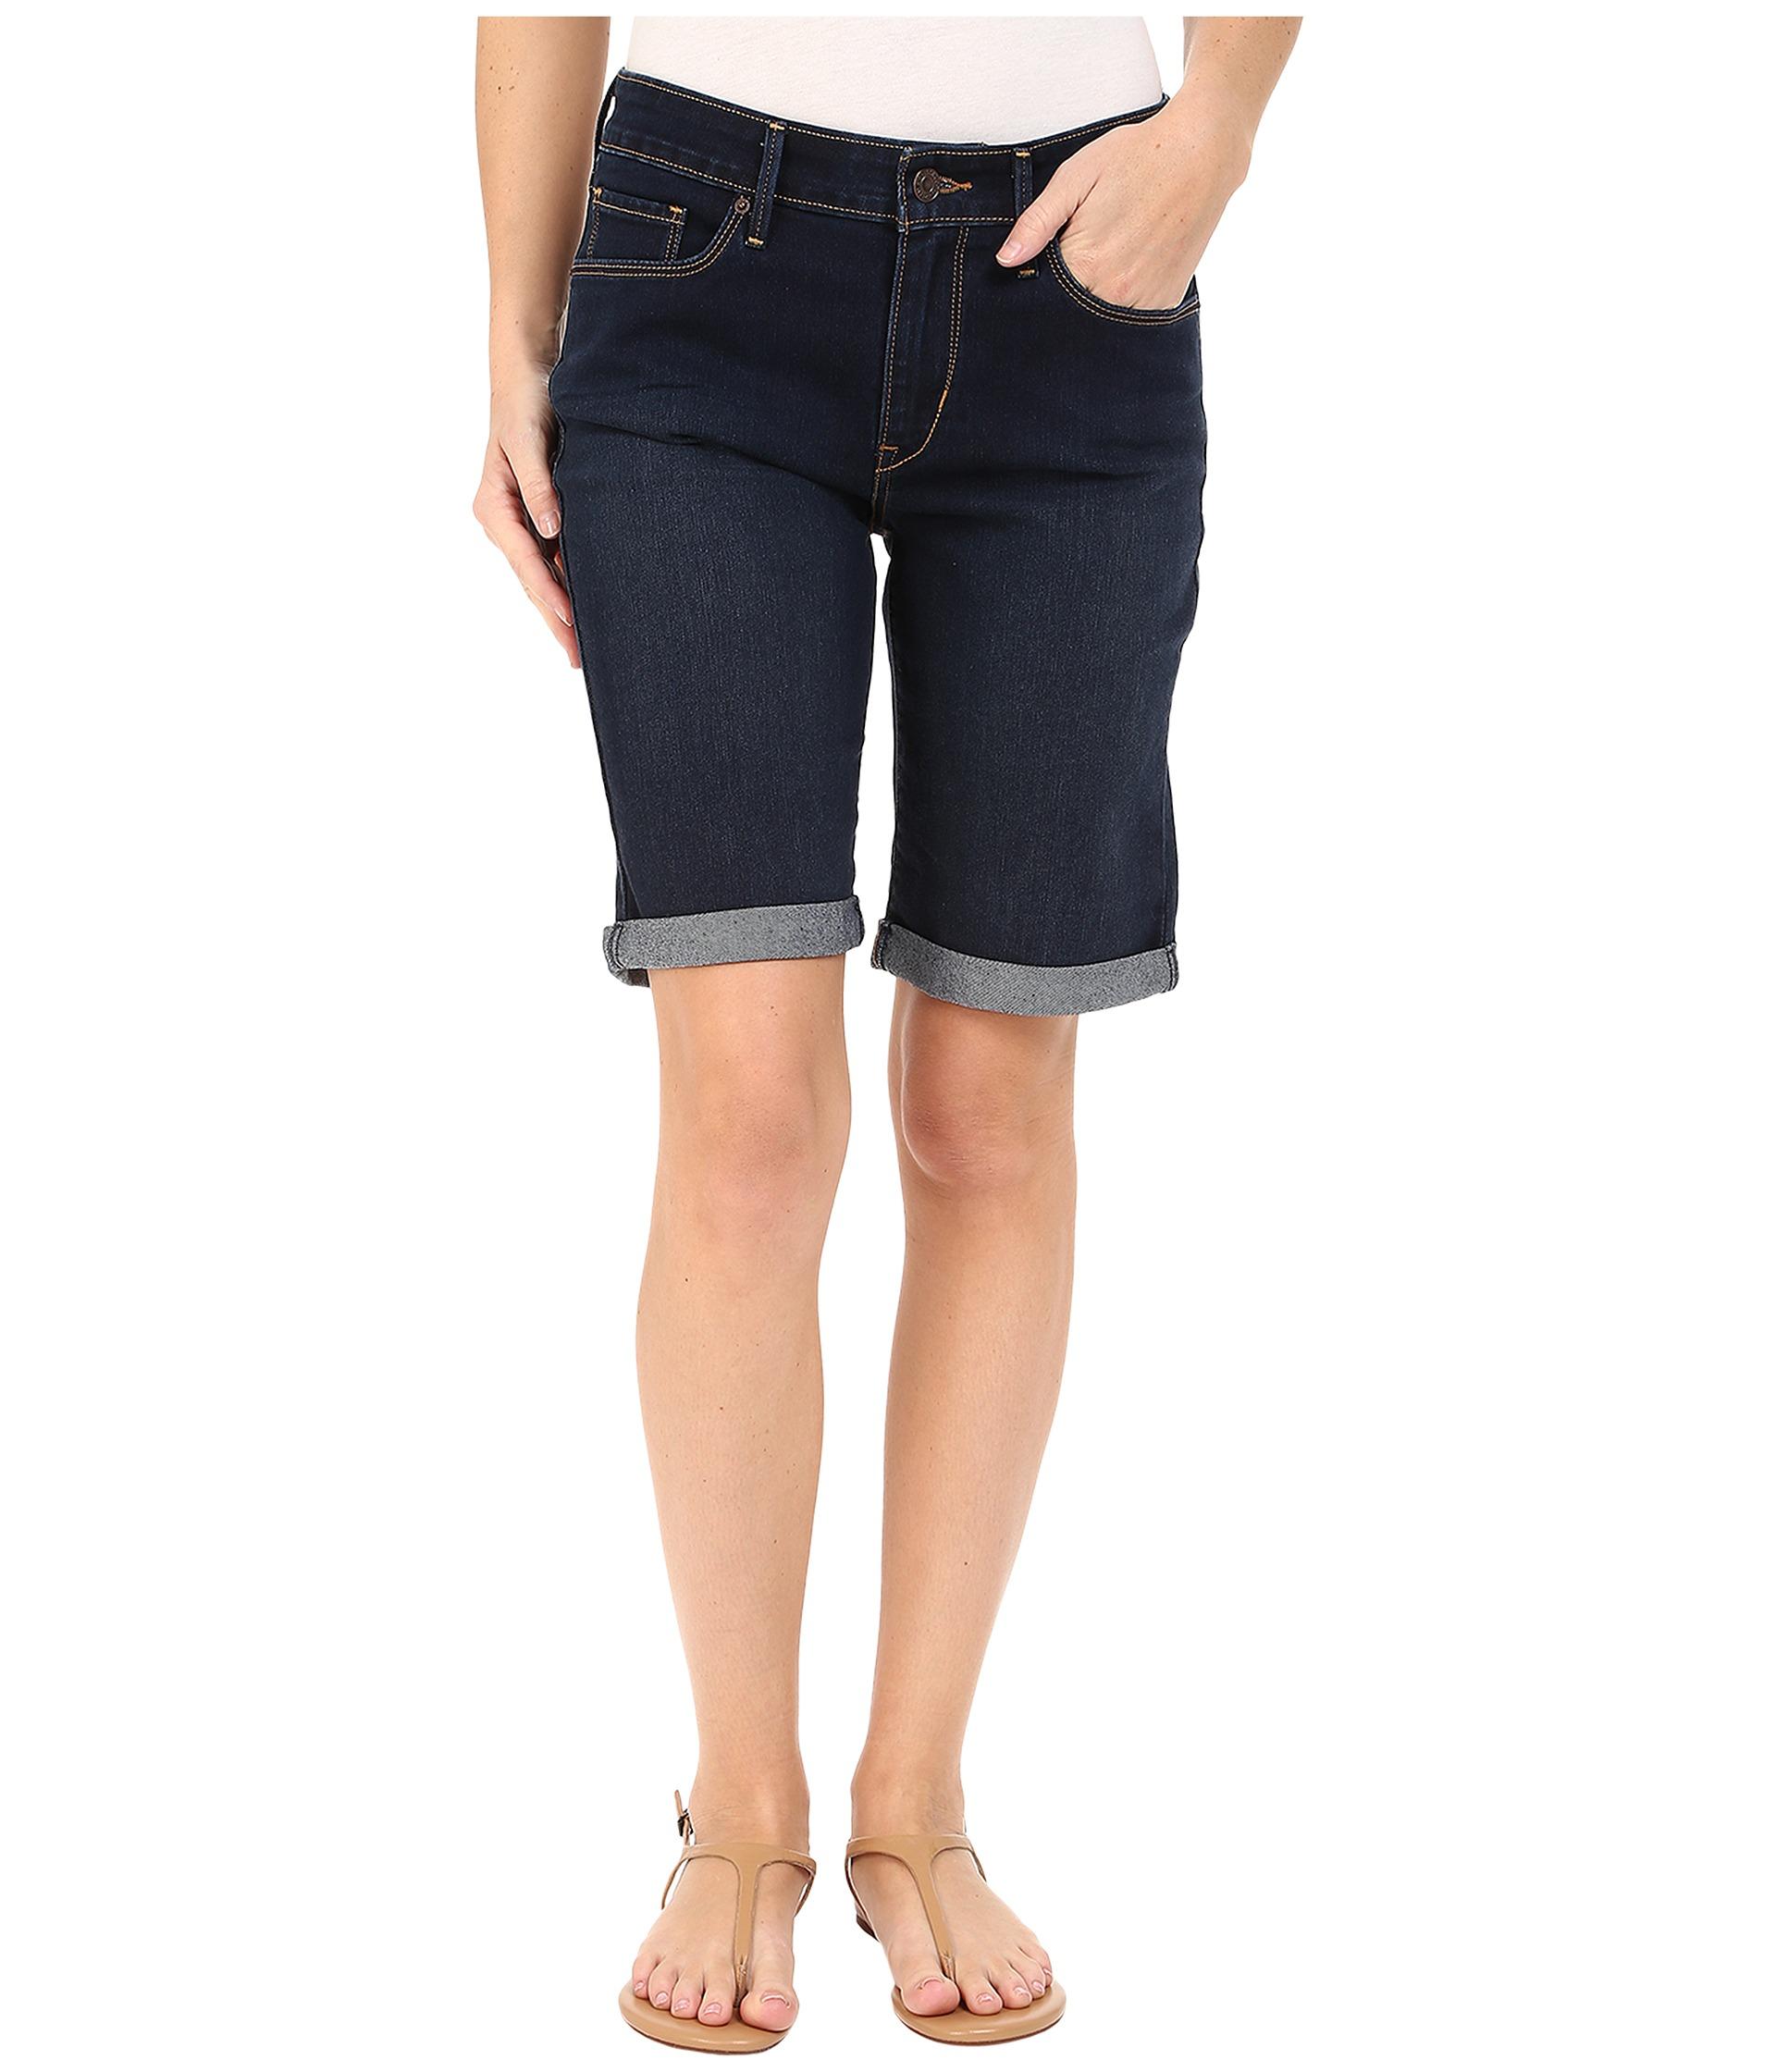 Levi's® Womens Bermuda Shorts Mulholland - Zappos.com Free Shipping BOTH Ways